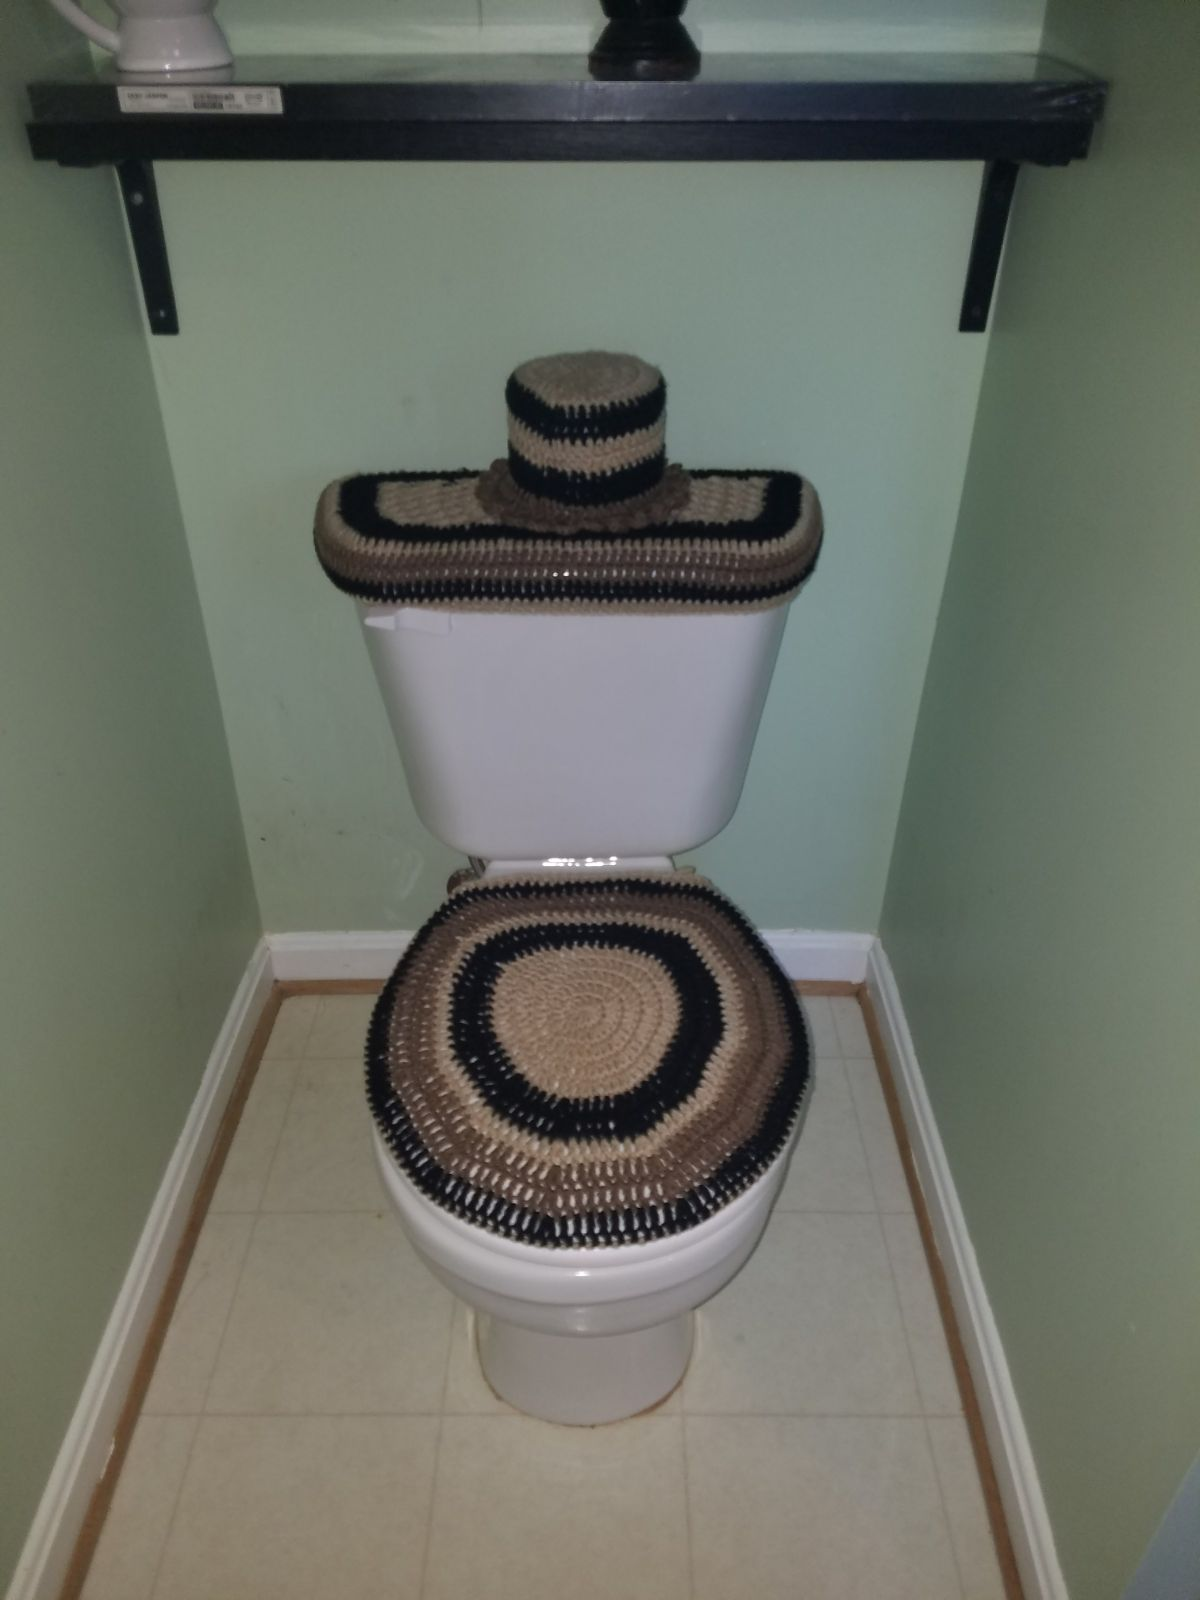 3 Pieces Crochet Handmade Bathroom Set Toilet Seat Cover